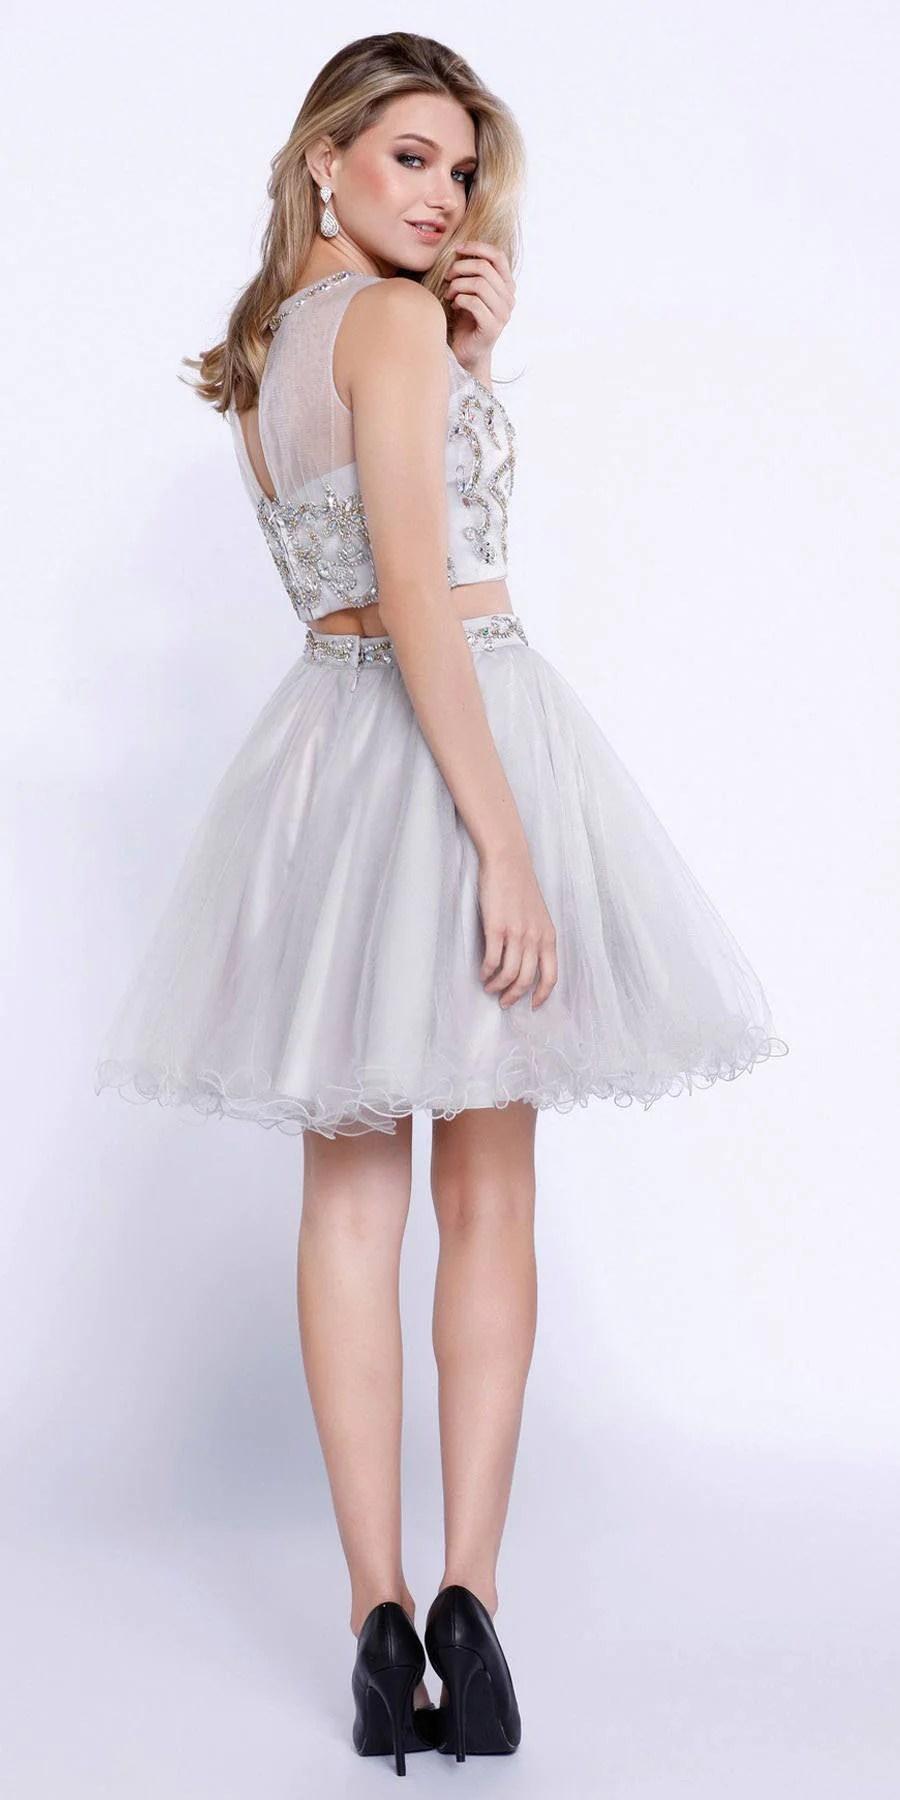 Silver TwoPiece Short Prom Dress Illusion Neckline Cut Out Back  DiscountDressShop